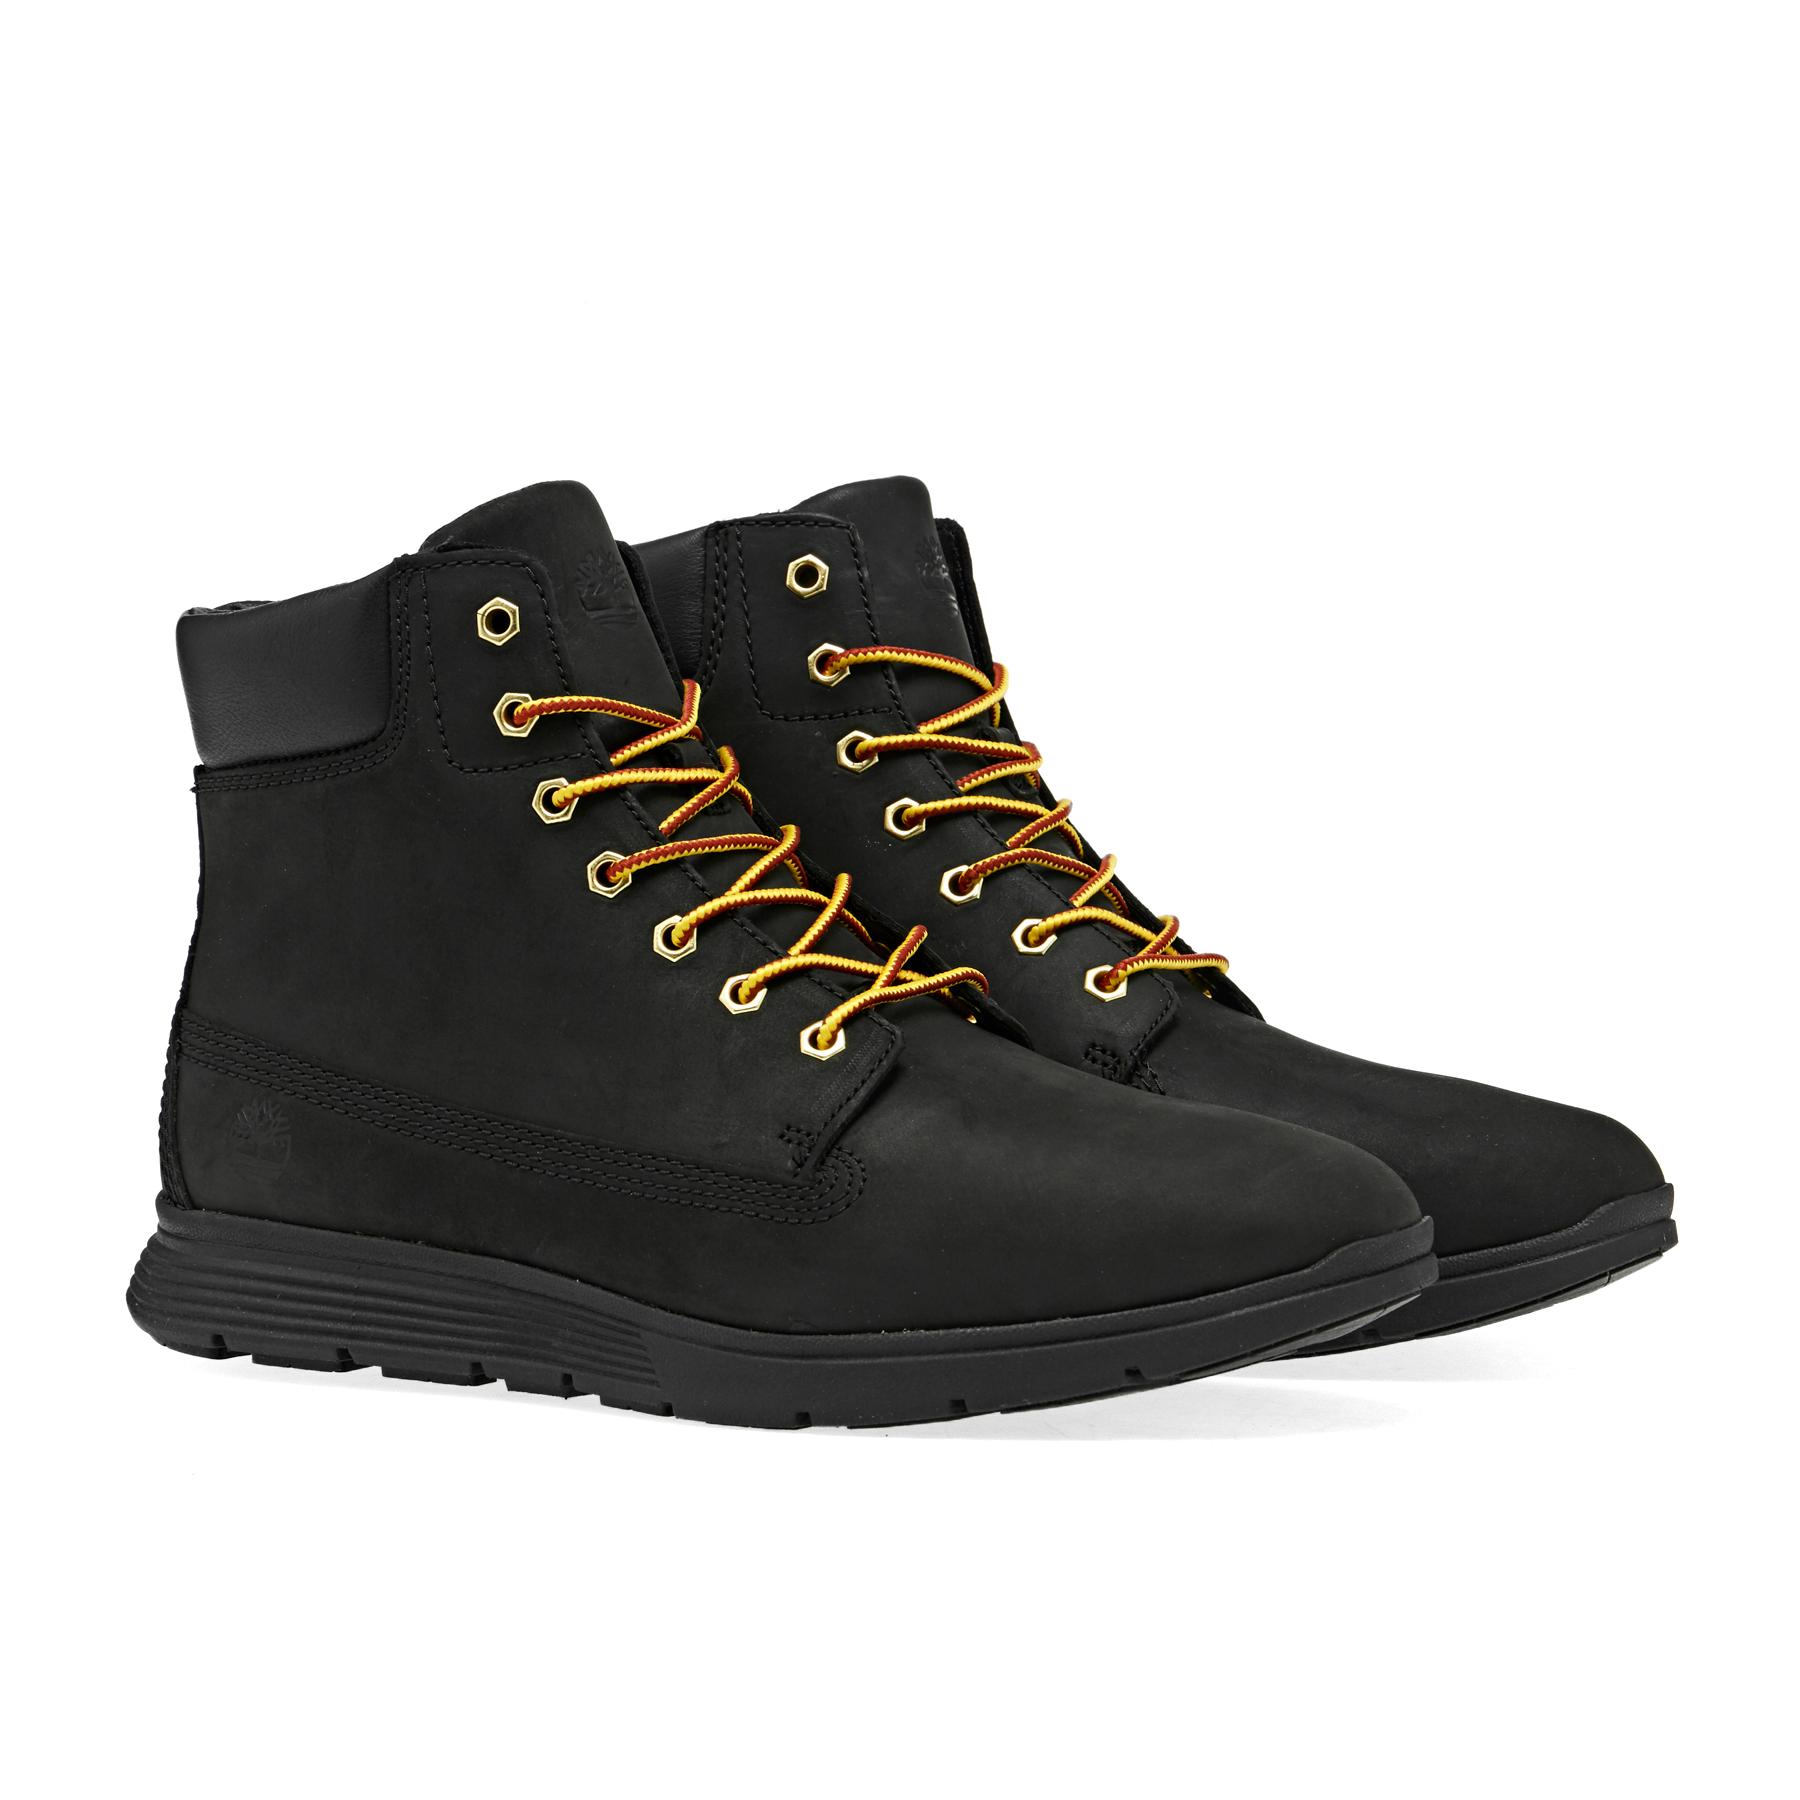 Timberland Killington Boots - Black